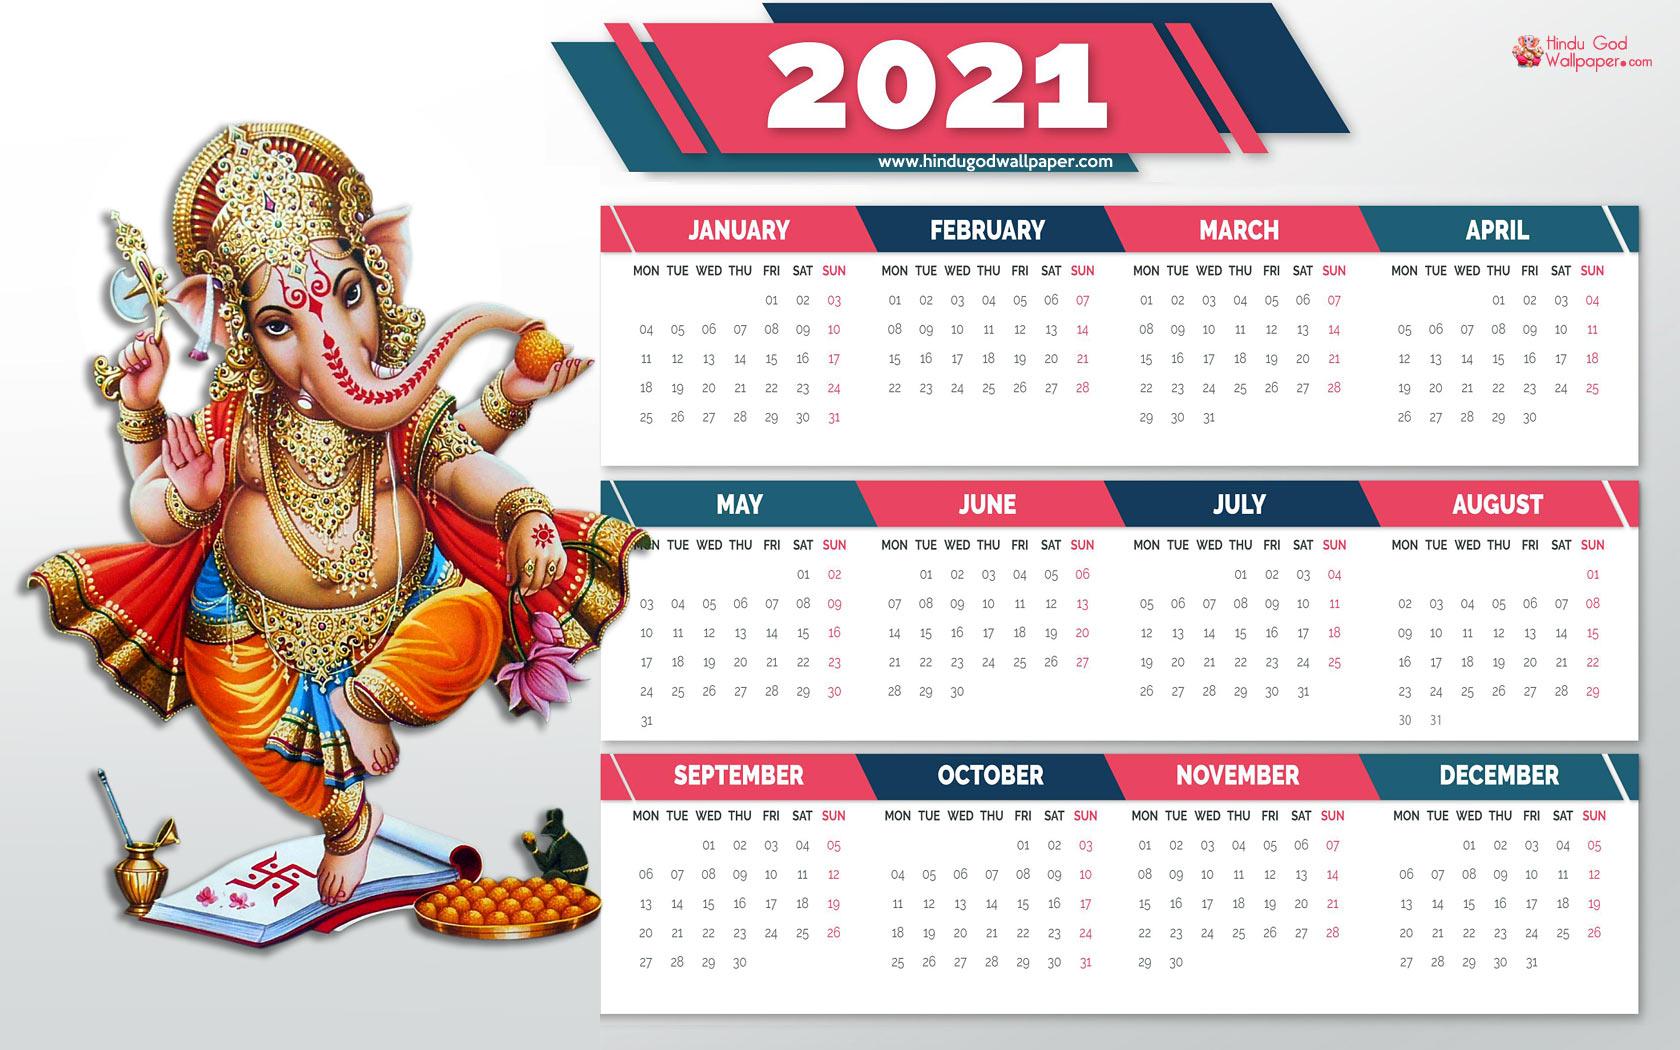 Calendar Wallpapers 2021 Desktop and Mobile Background 1680x1050